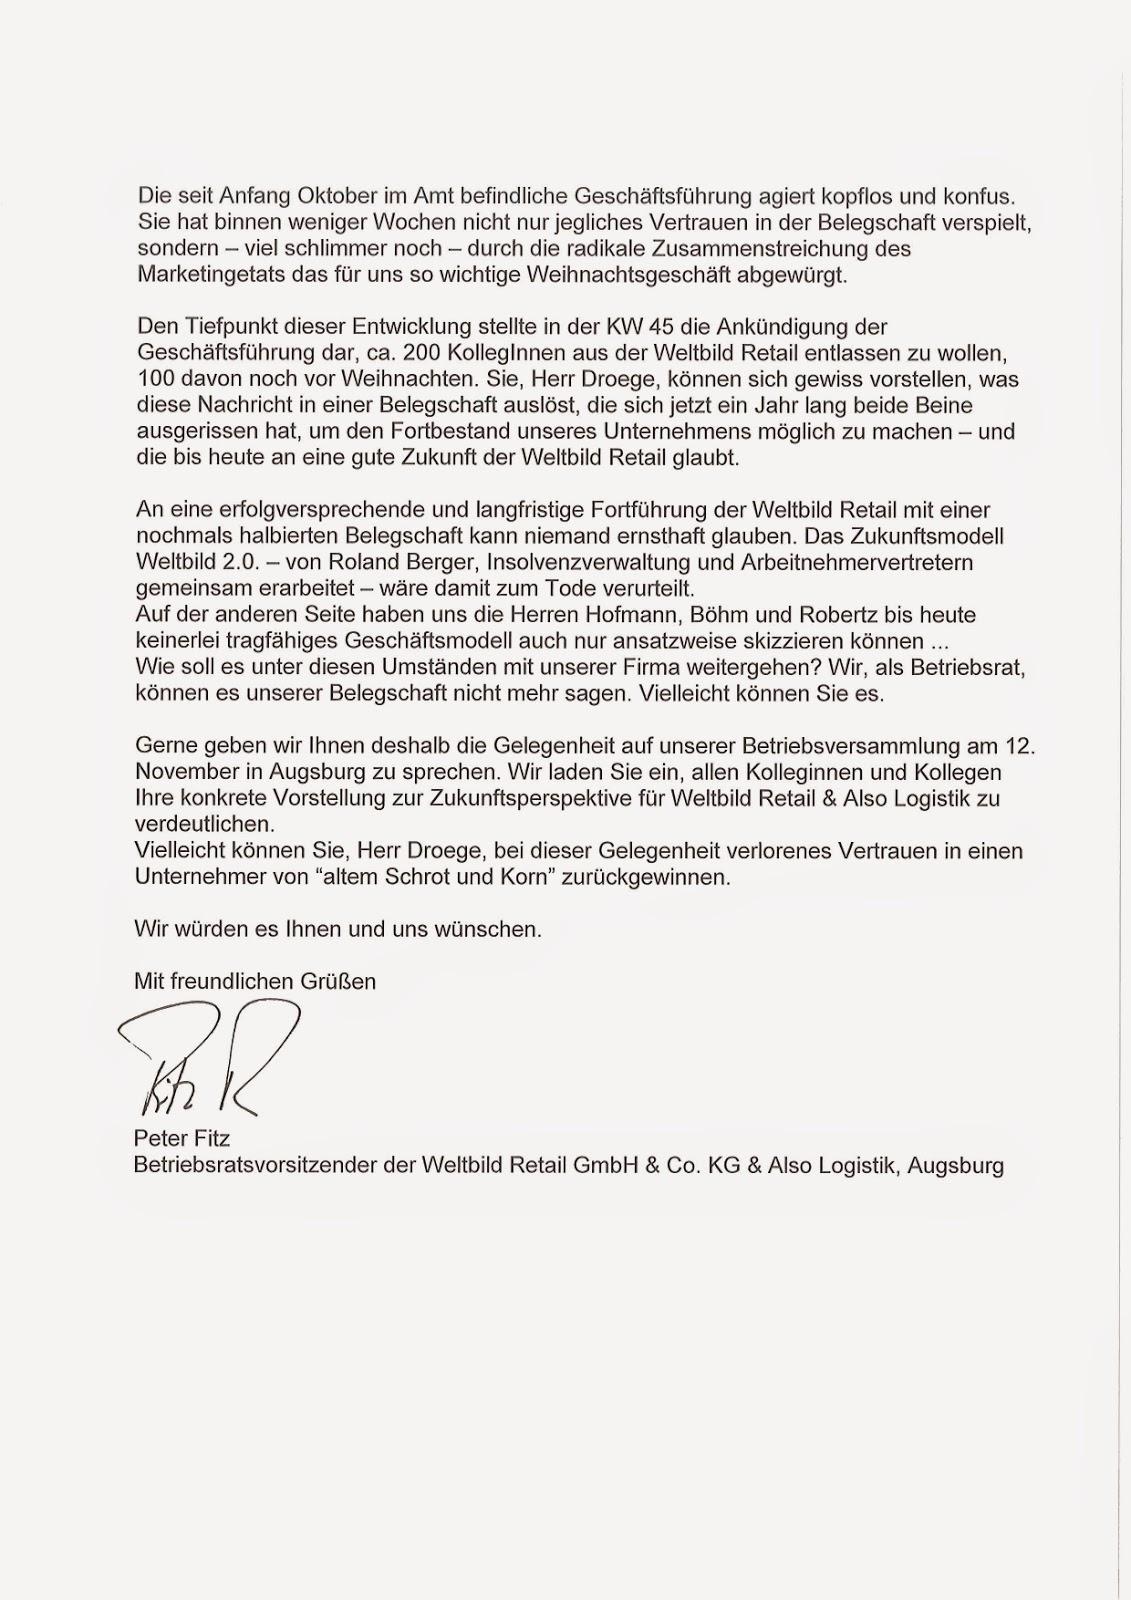 weltbild verdi infoblog: november 2014, Einladung